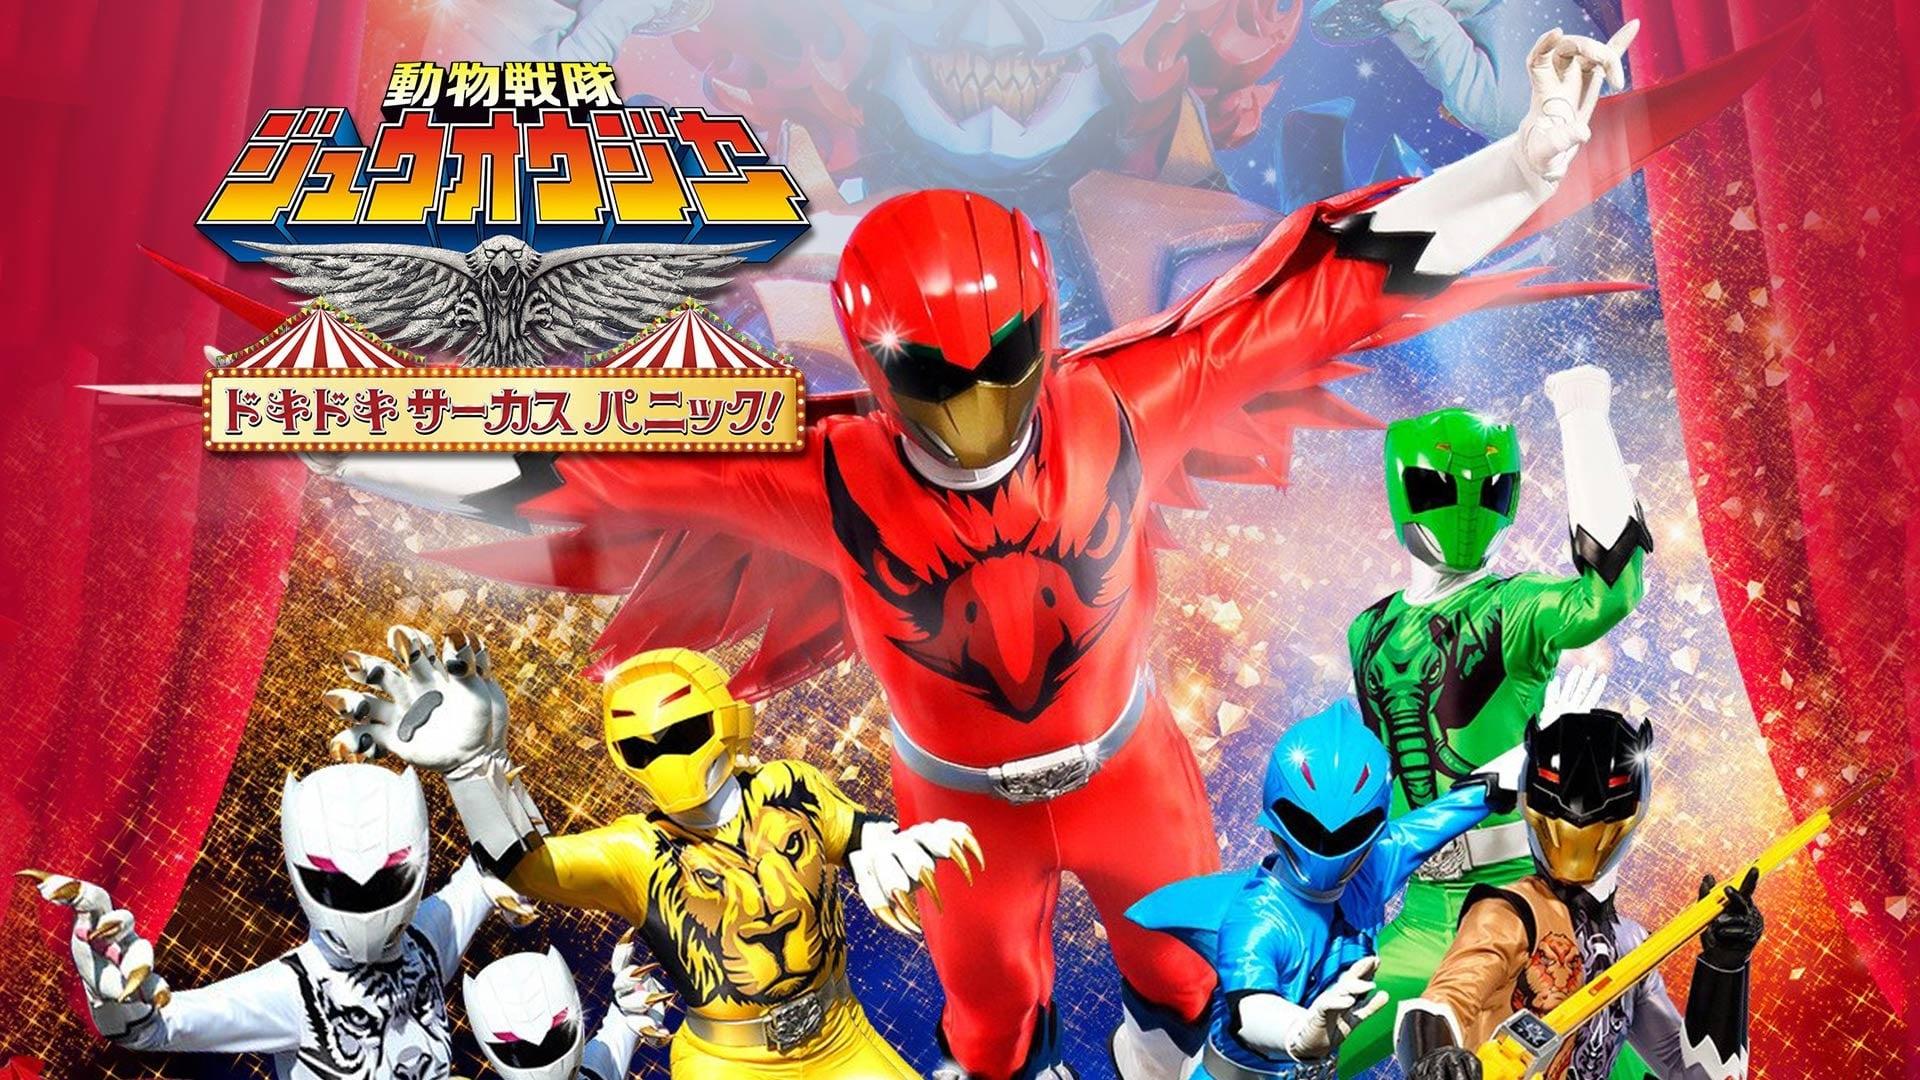 Doubutsu Sentai Zyuohger The Movie The Heart Pounding Circus Panic 1